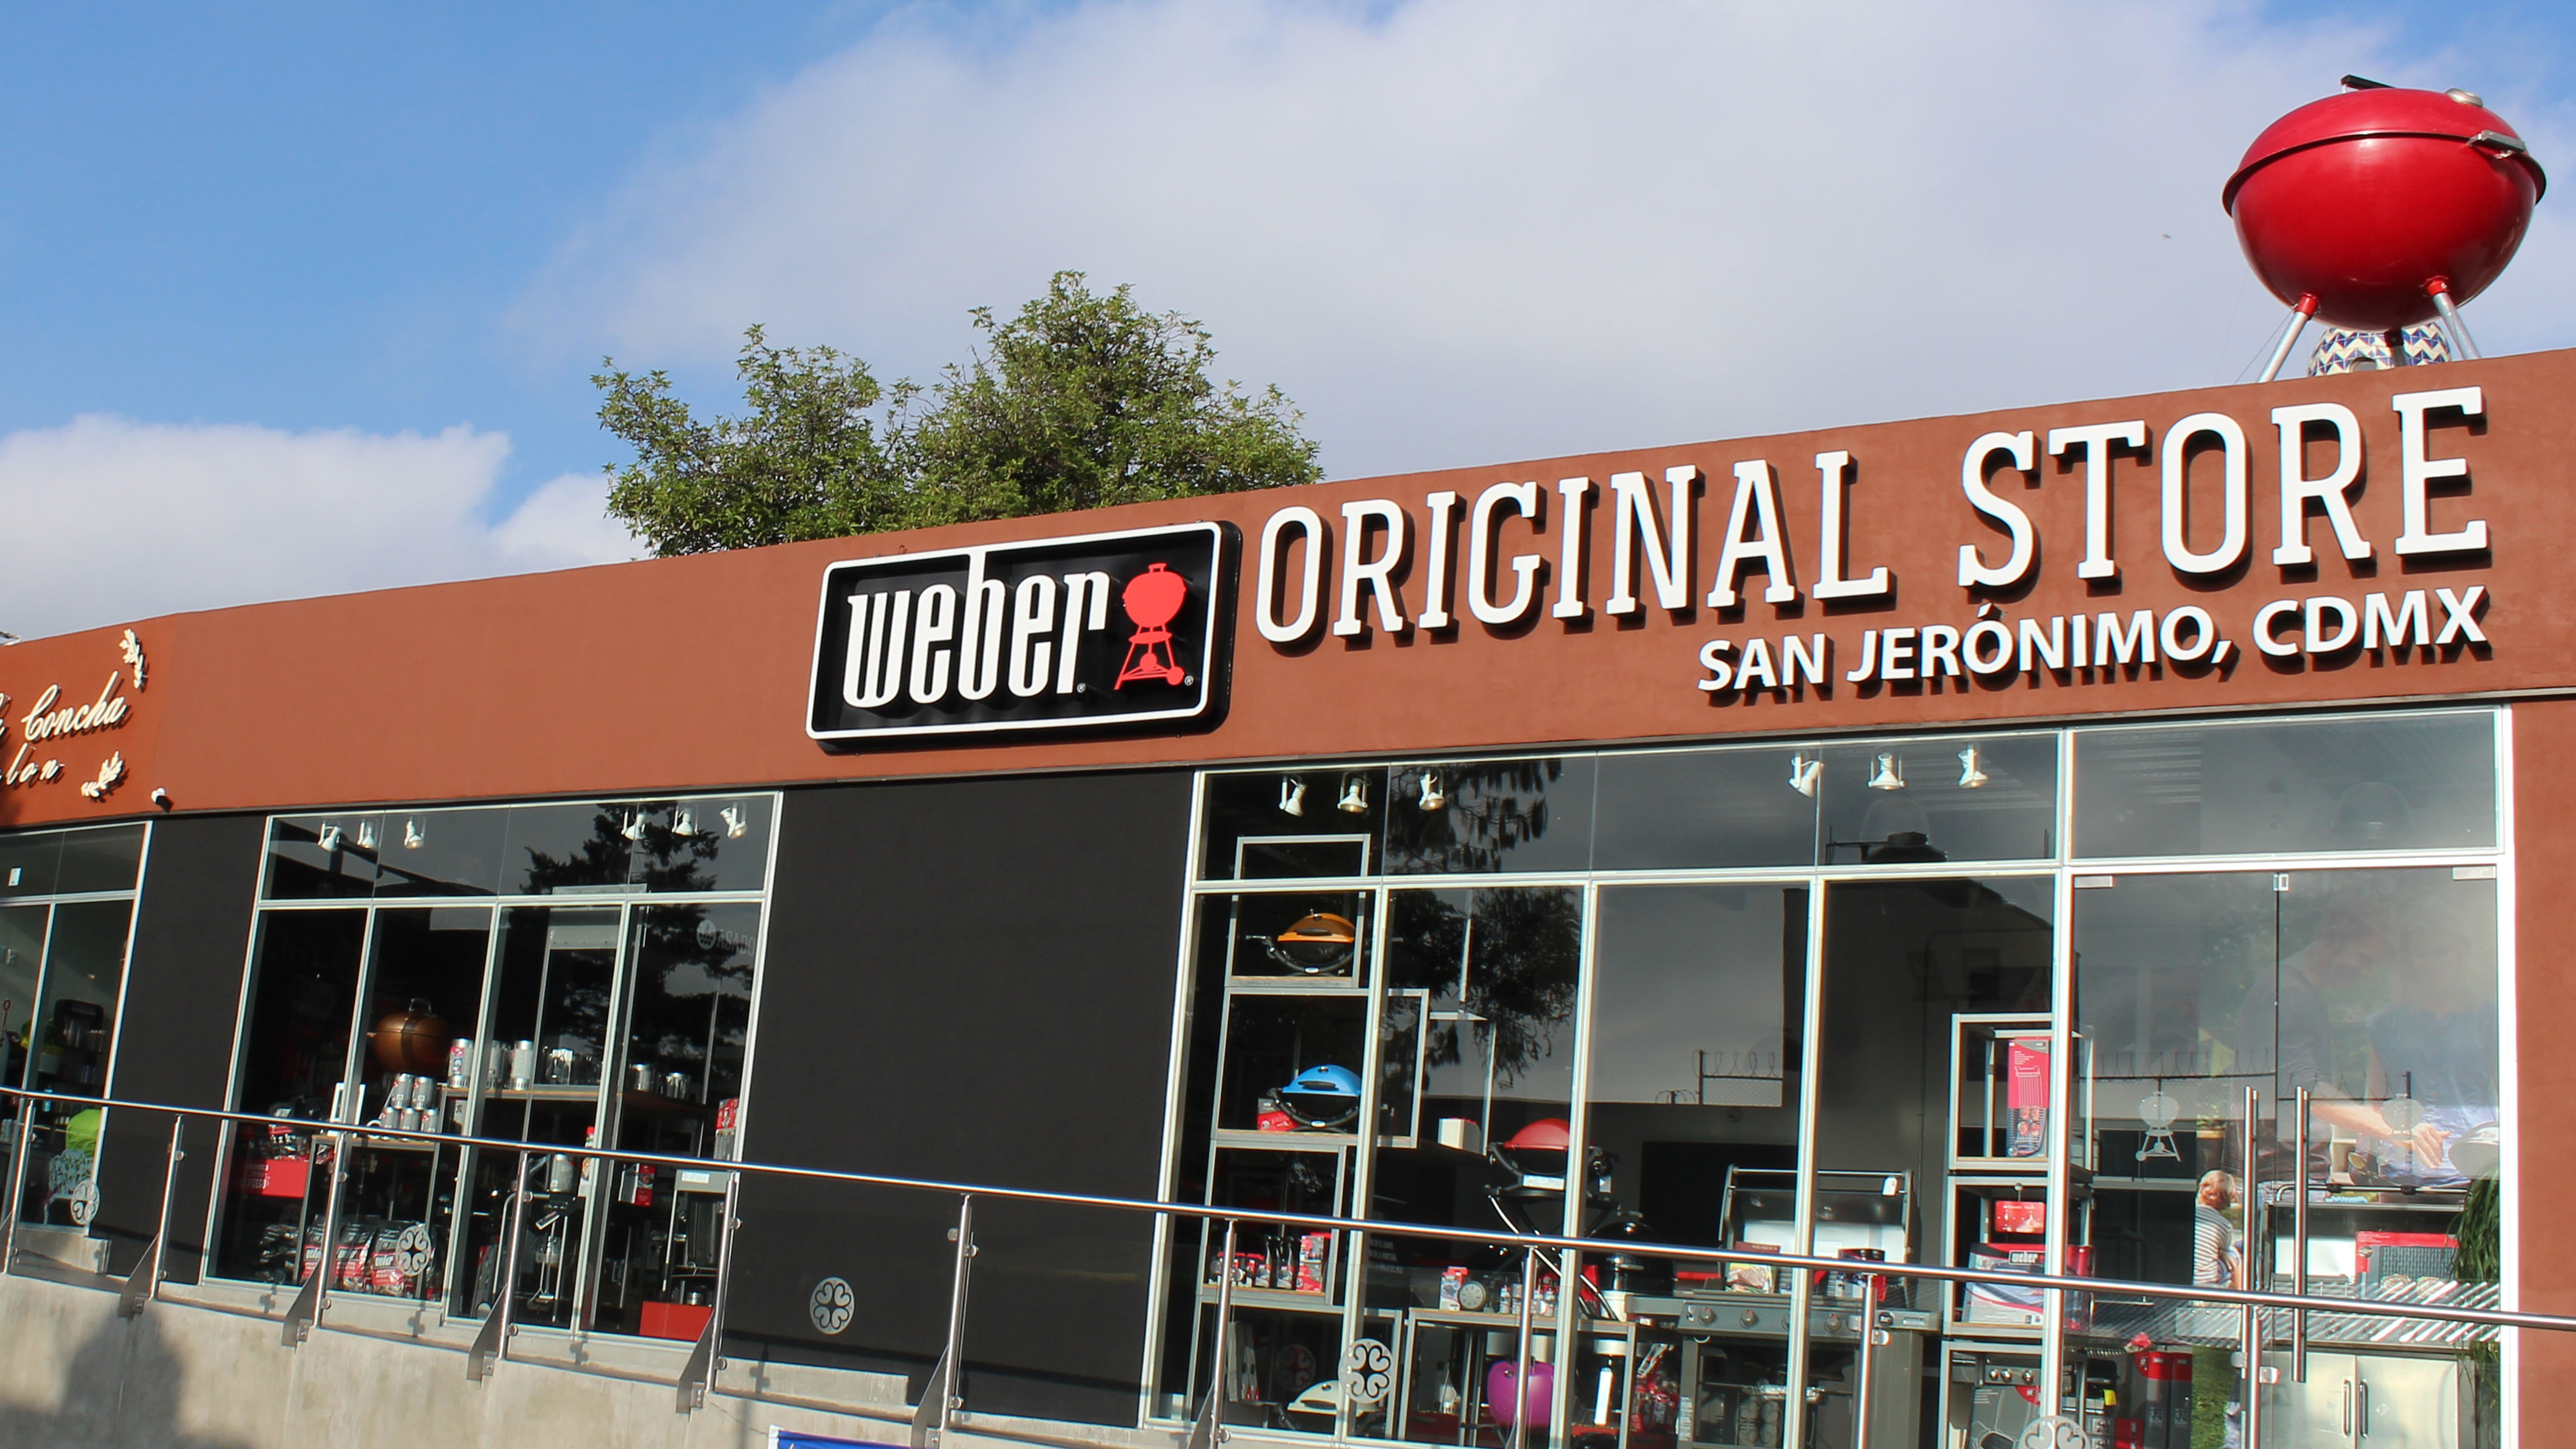 Weber Original Store san Jerónimo